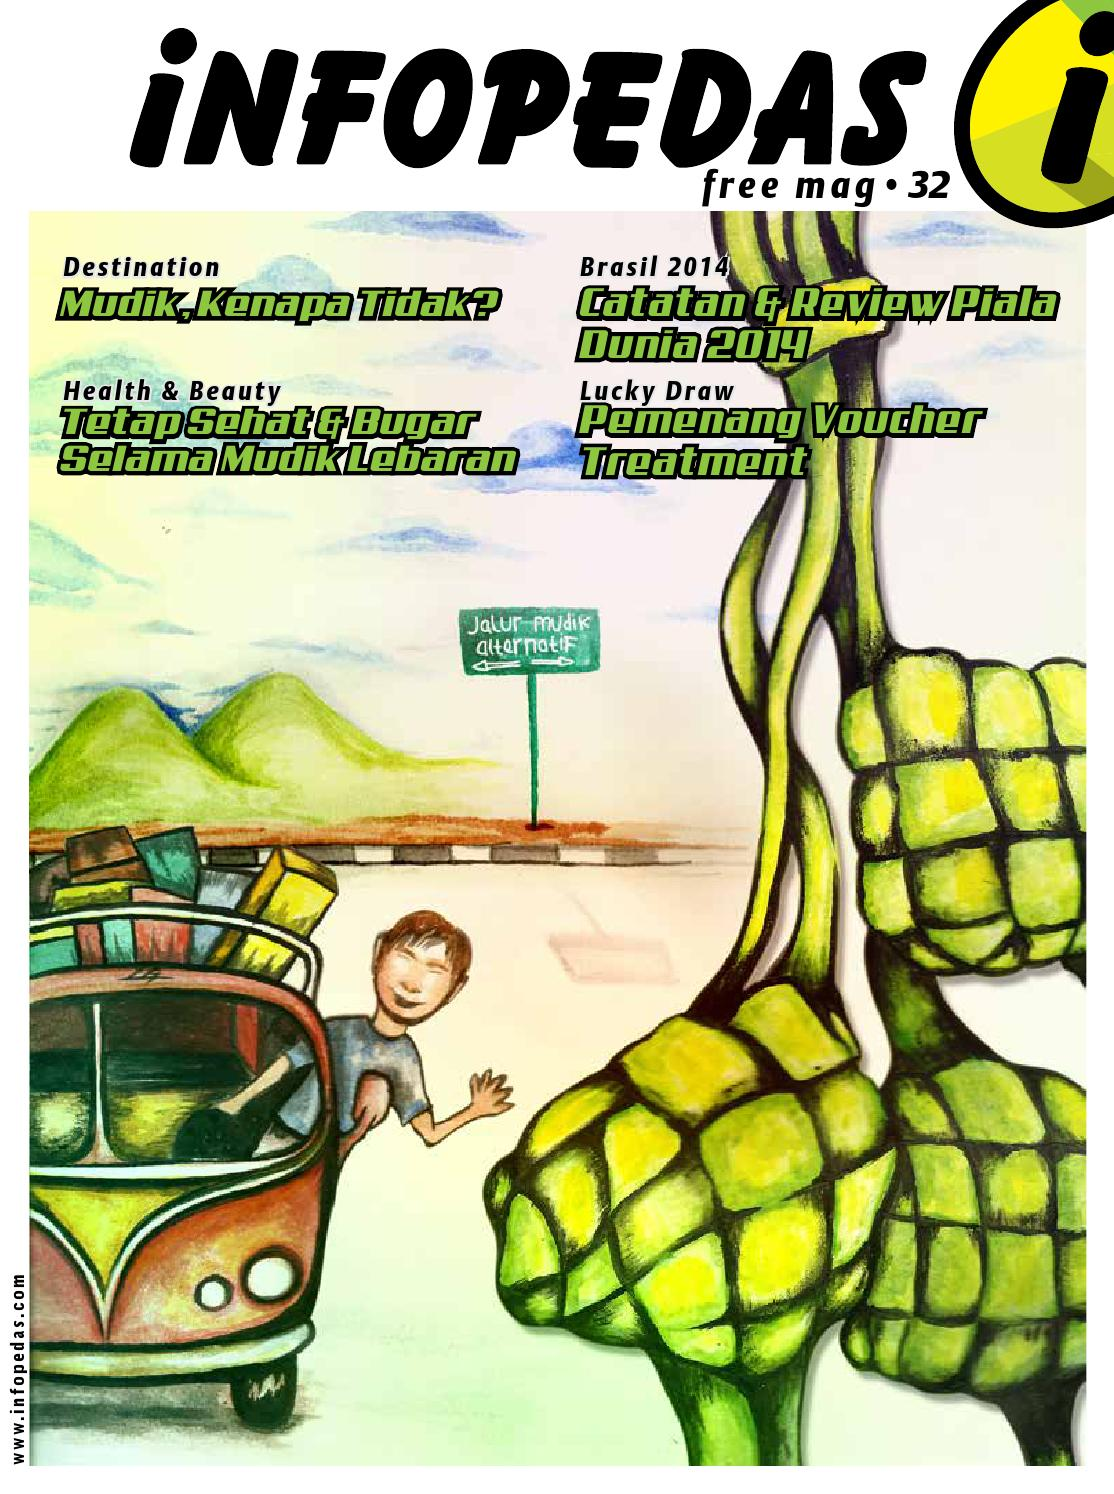 Majalah Infopedas Edisi 32 By Pedas Issuu Rejeki Anak Soleh 3 Voucher Carrefour Rp 200000